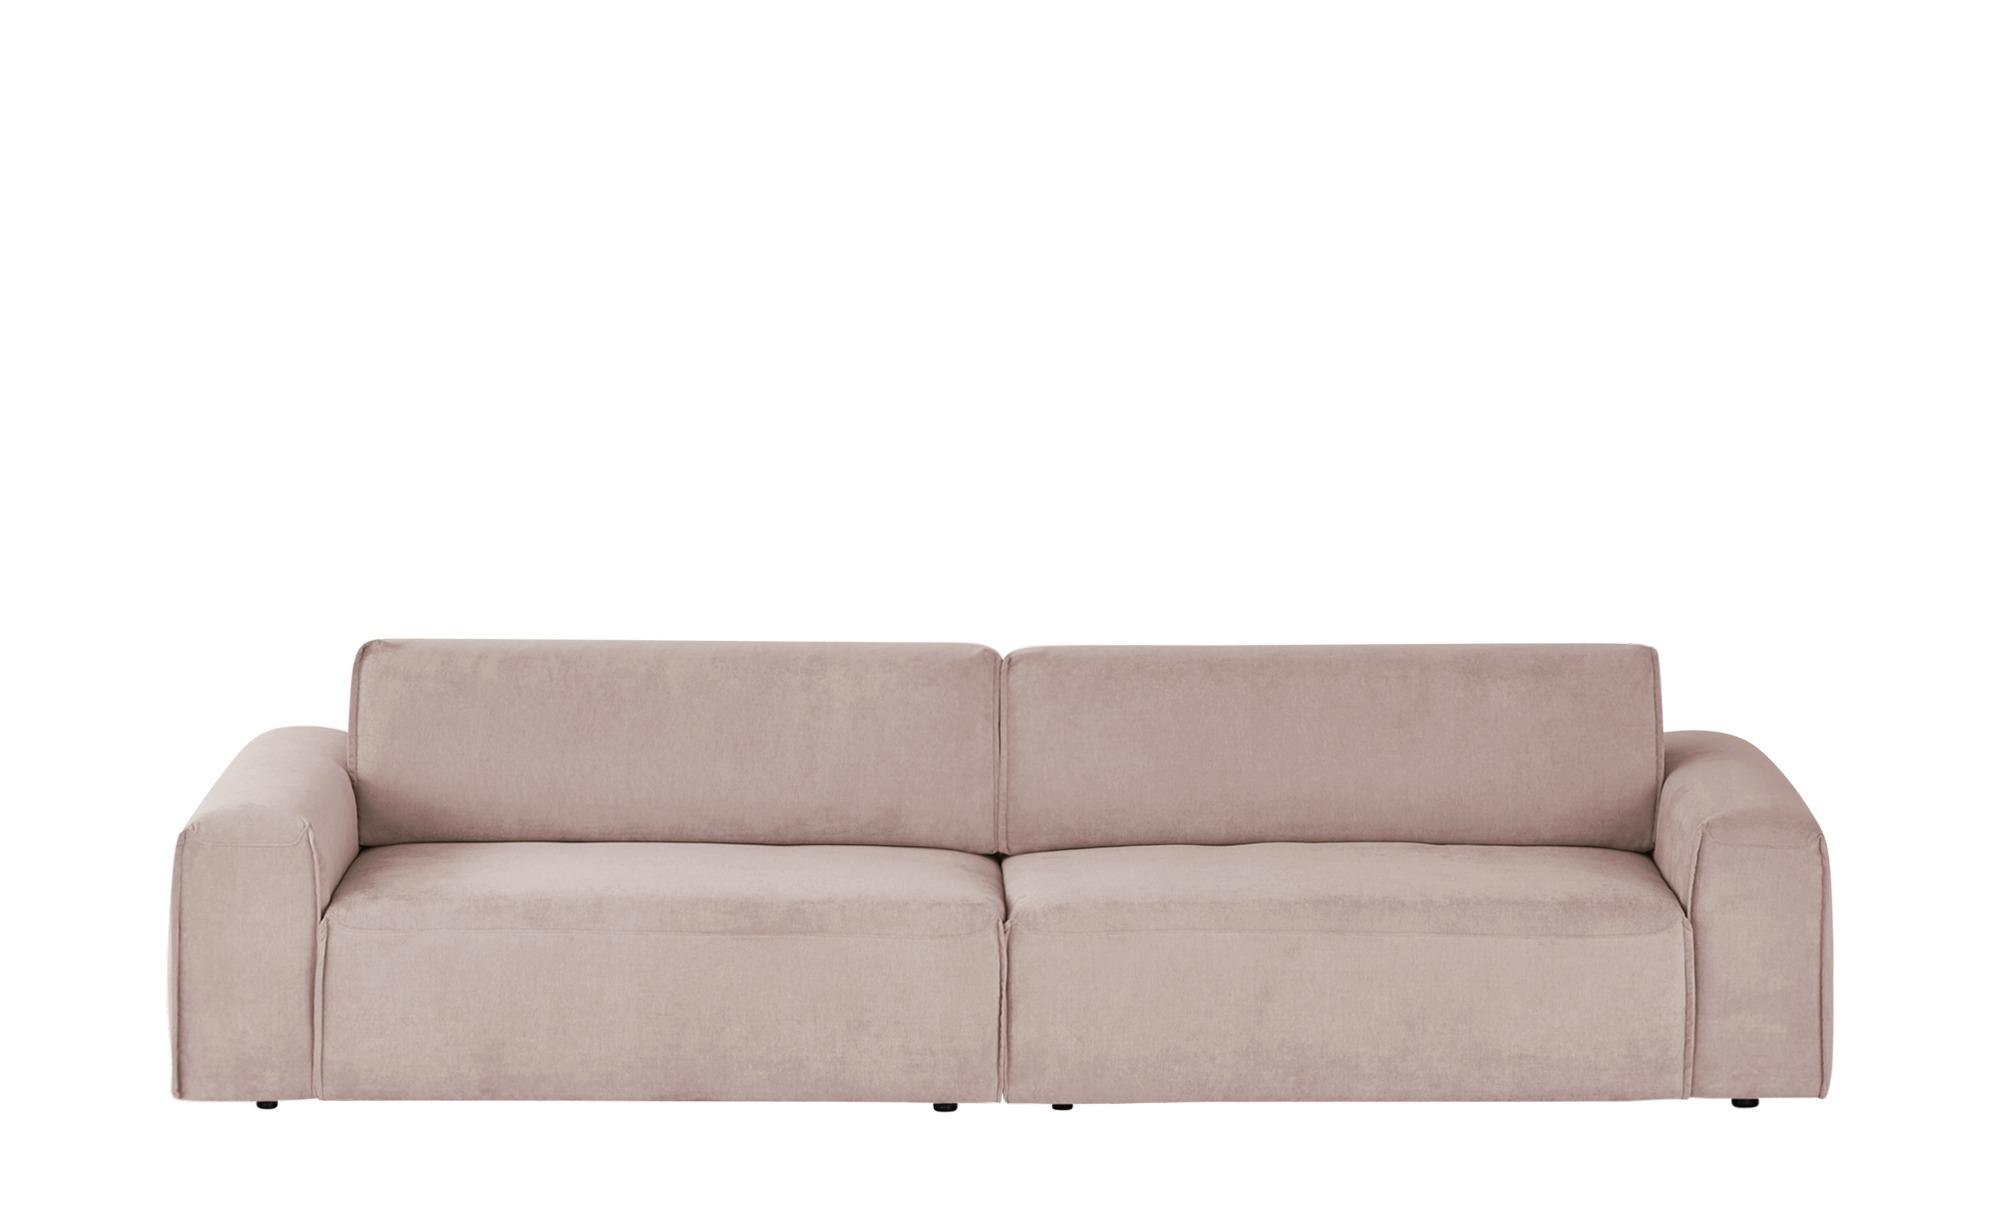 Max Schelling Big Sofa  Life ¦ rosa/pink ¦ Maße (cm): B: 296 T: 120 Polstermöbel > Sofas > Big-Sofas - Höffner